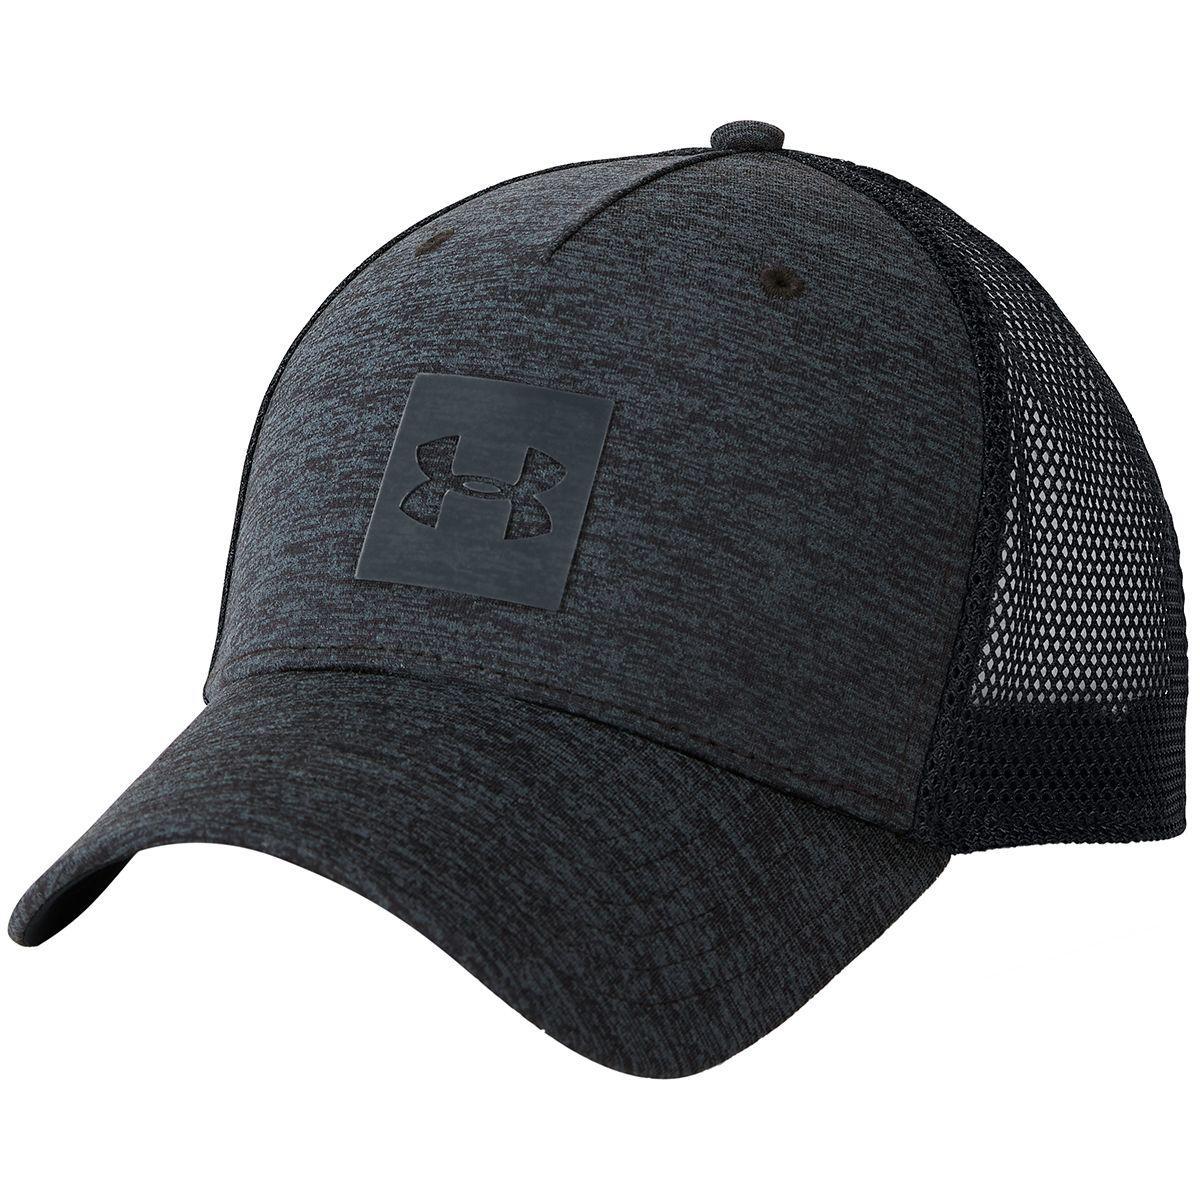 half off 2a741 b1b20 Lyst - Under Armour Twist Closer Trucker Hat in Black for Men